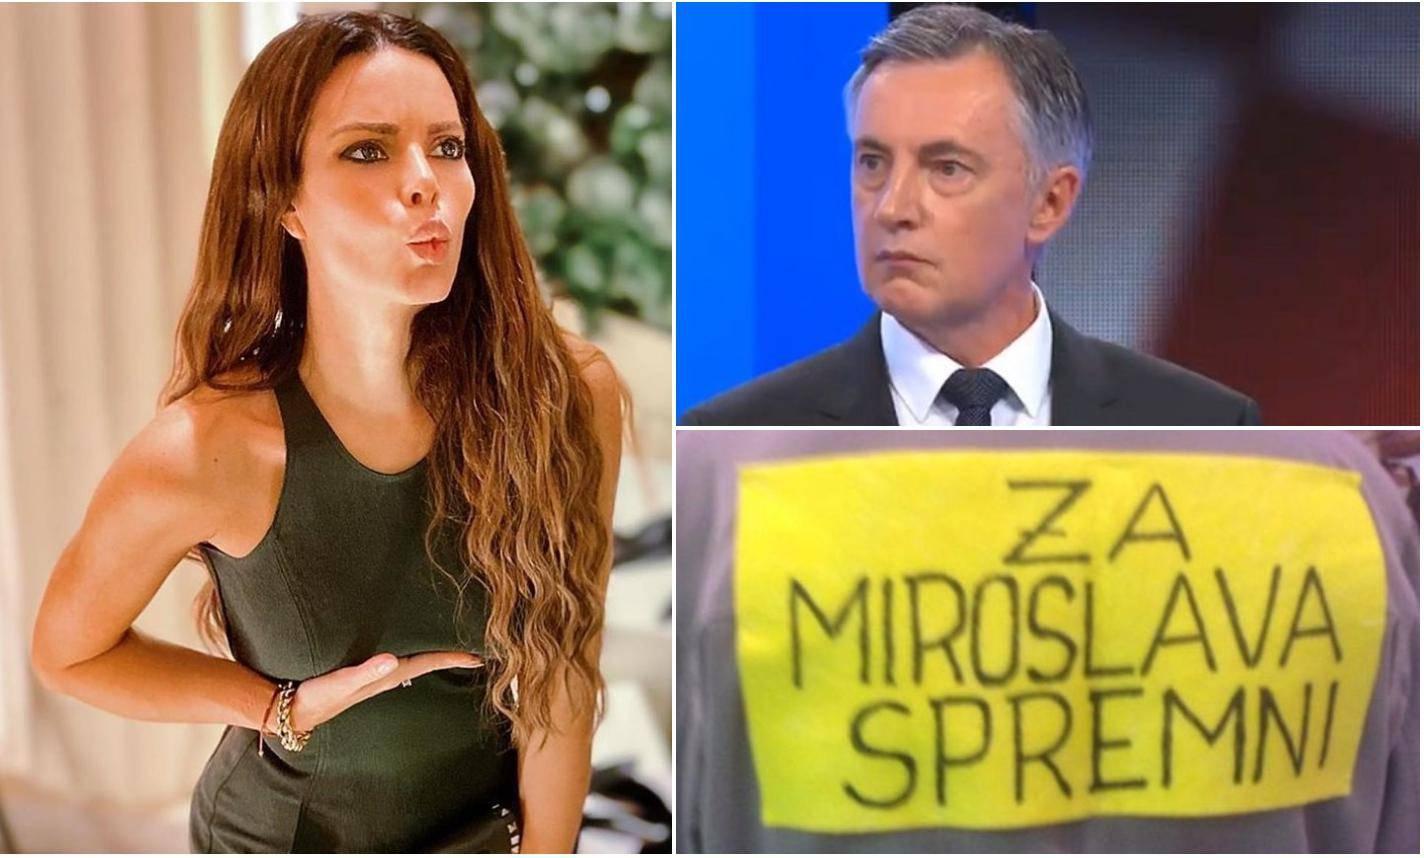 Objavila i fotke: Nikolini Pišek je mučno od Škorinih glasača...